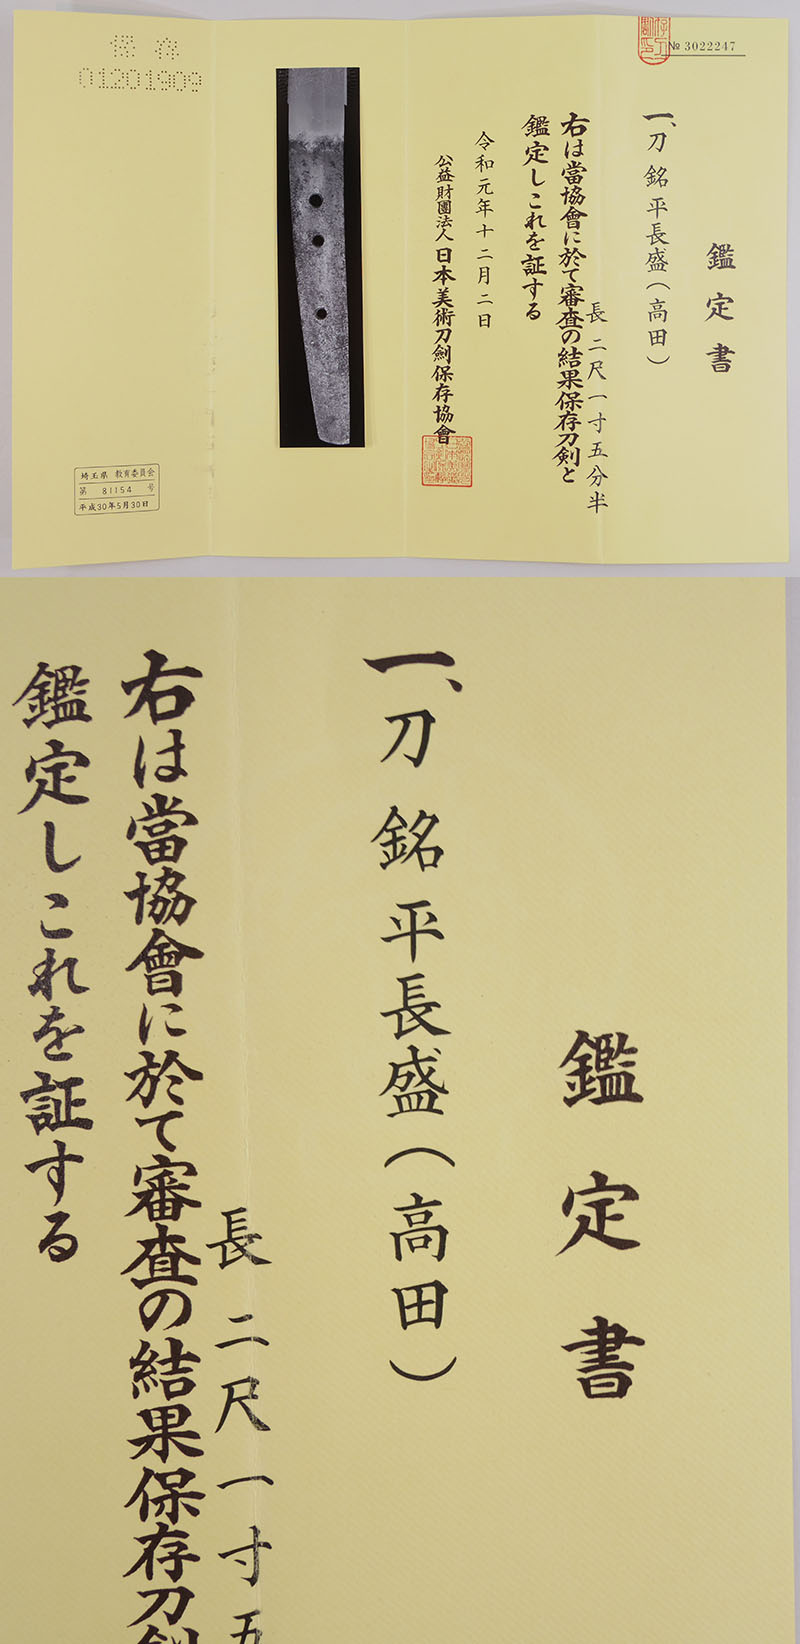 刀 平長盛(平高田)(平高田中随一の名工) Picture of Certificate